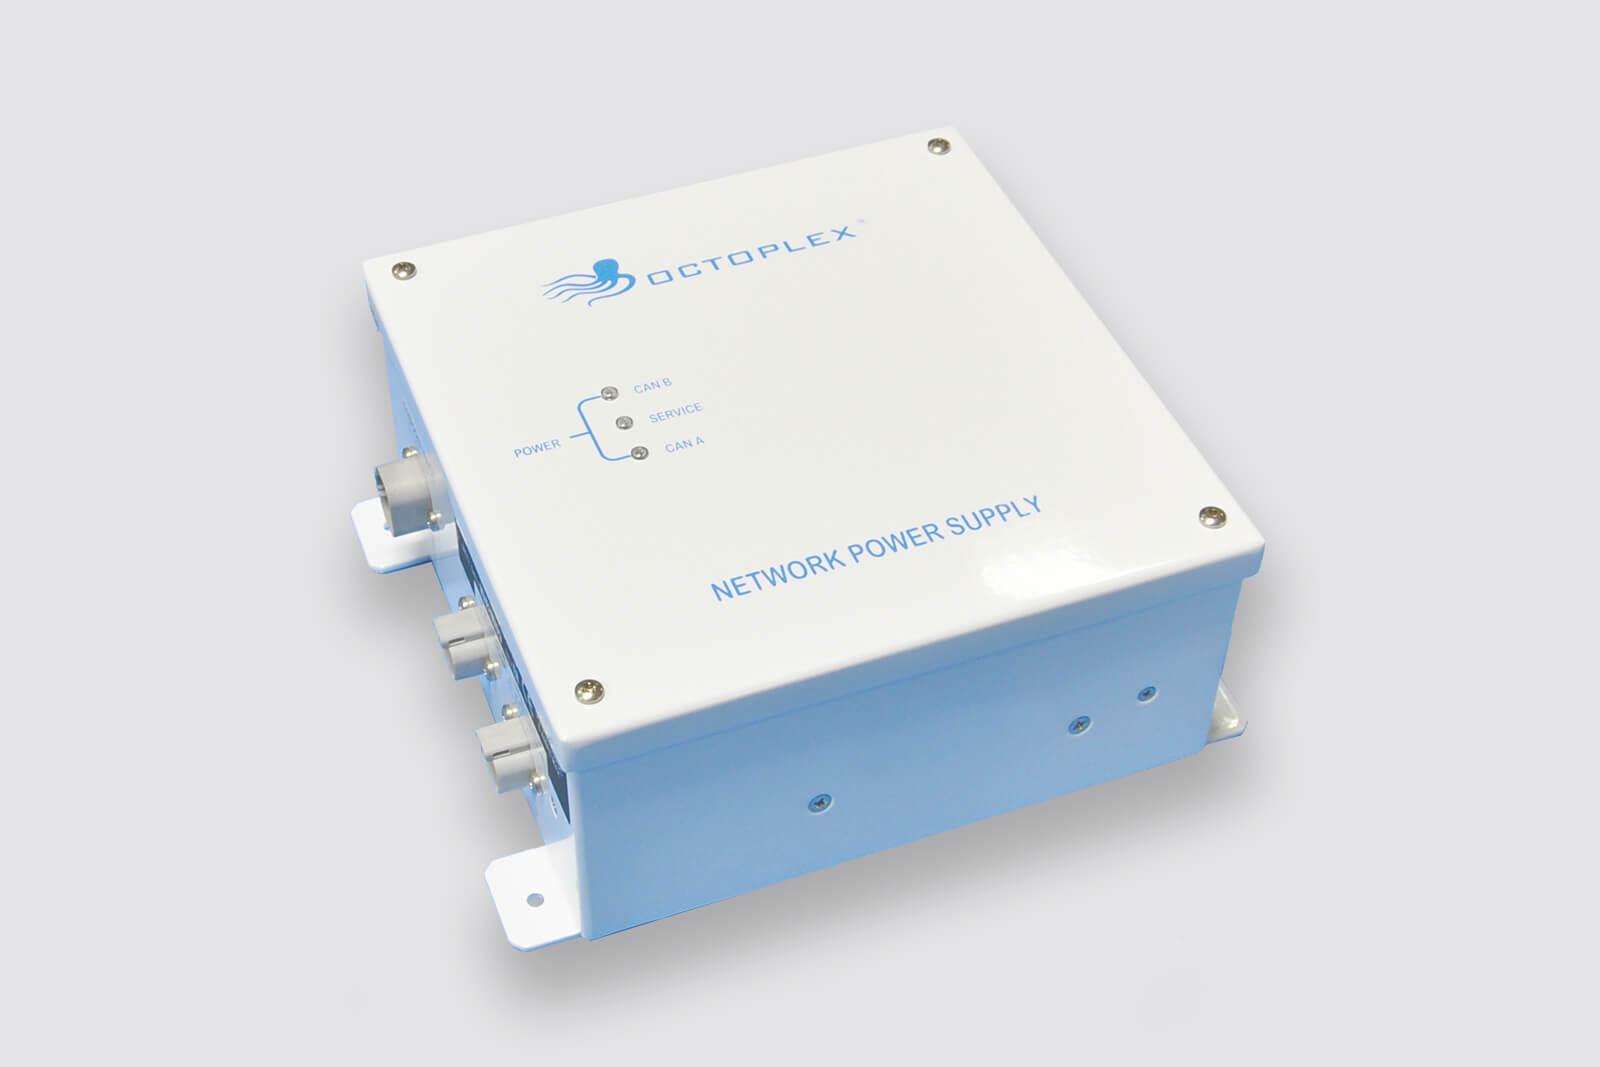 OctoPlex Network Power Supply